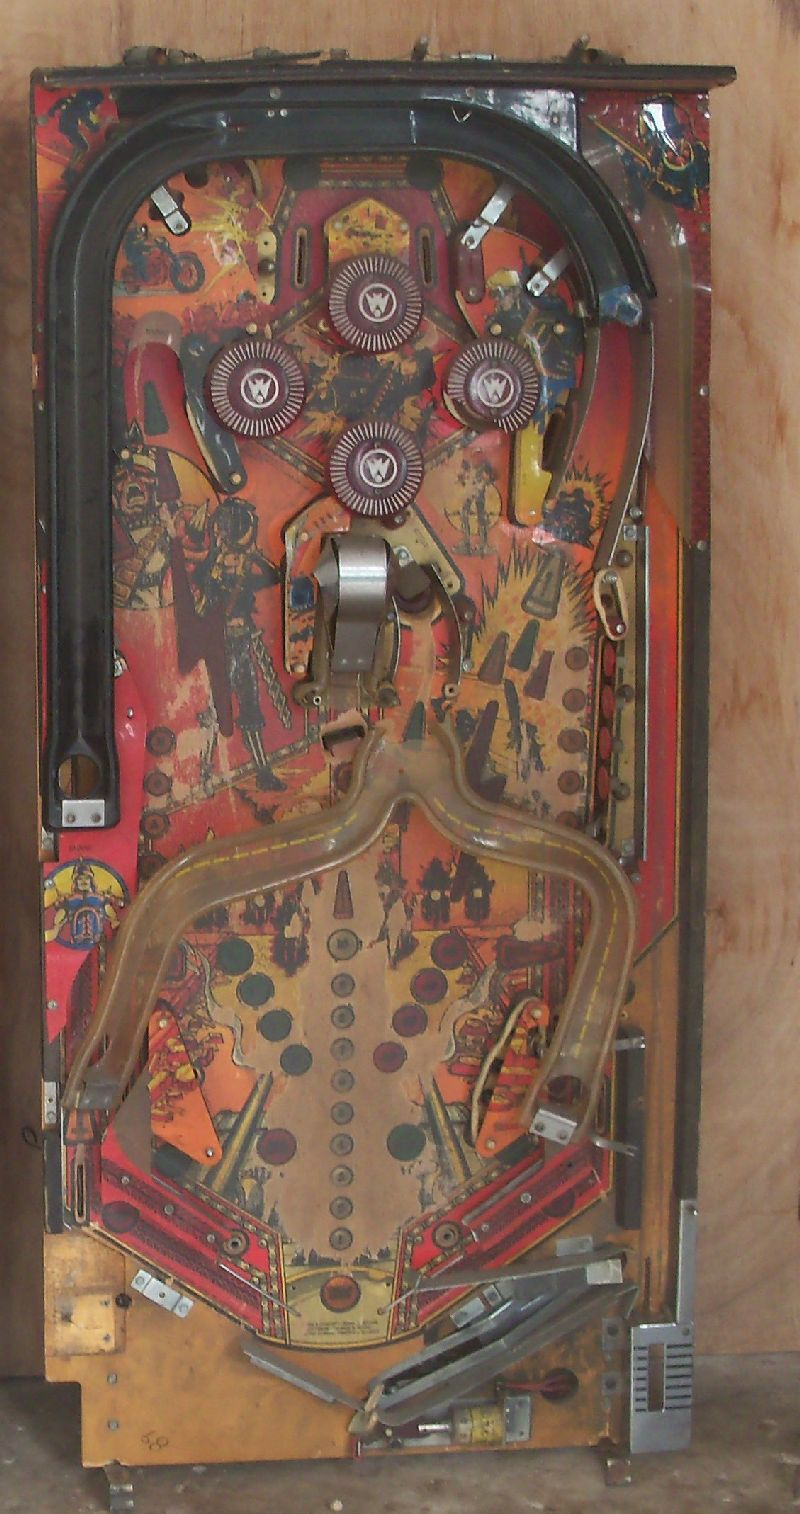 Star Wars Pinball Machine >> REM Pinball - Vintage Pinball Machines and Parts For Sale